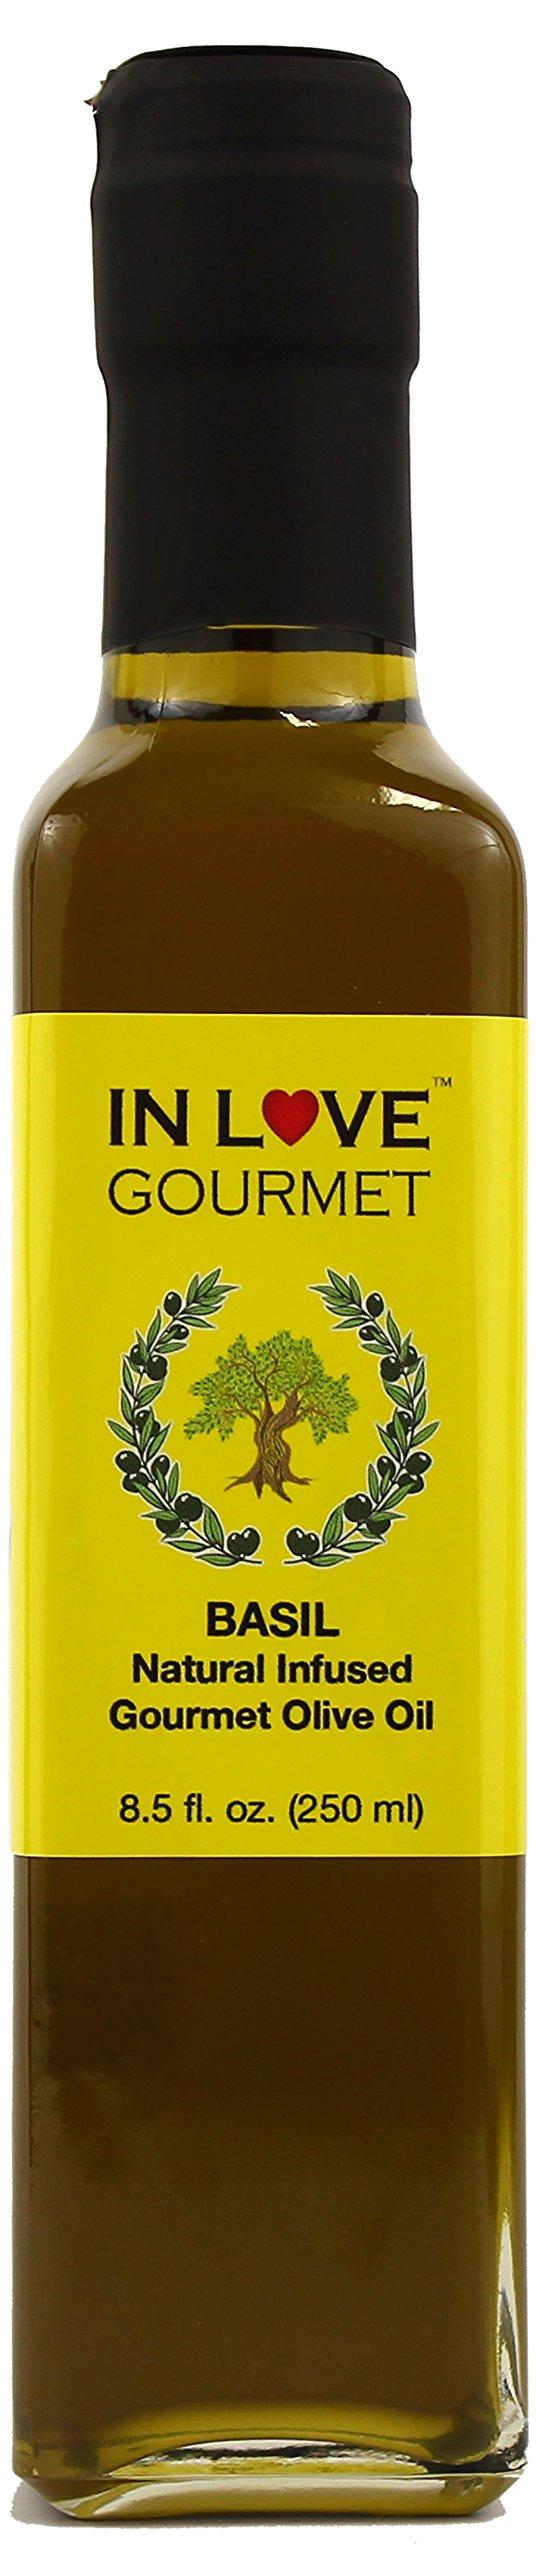 In Love Gourmet Basil Natural Flavor Infused Olive Oil 250ML/8.5oz Extra Virgin Basil Olive oil